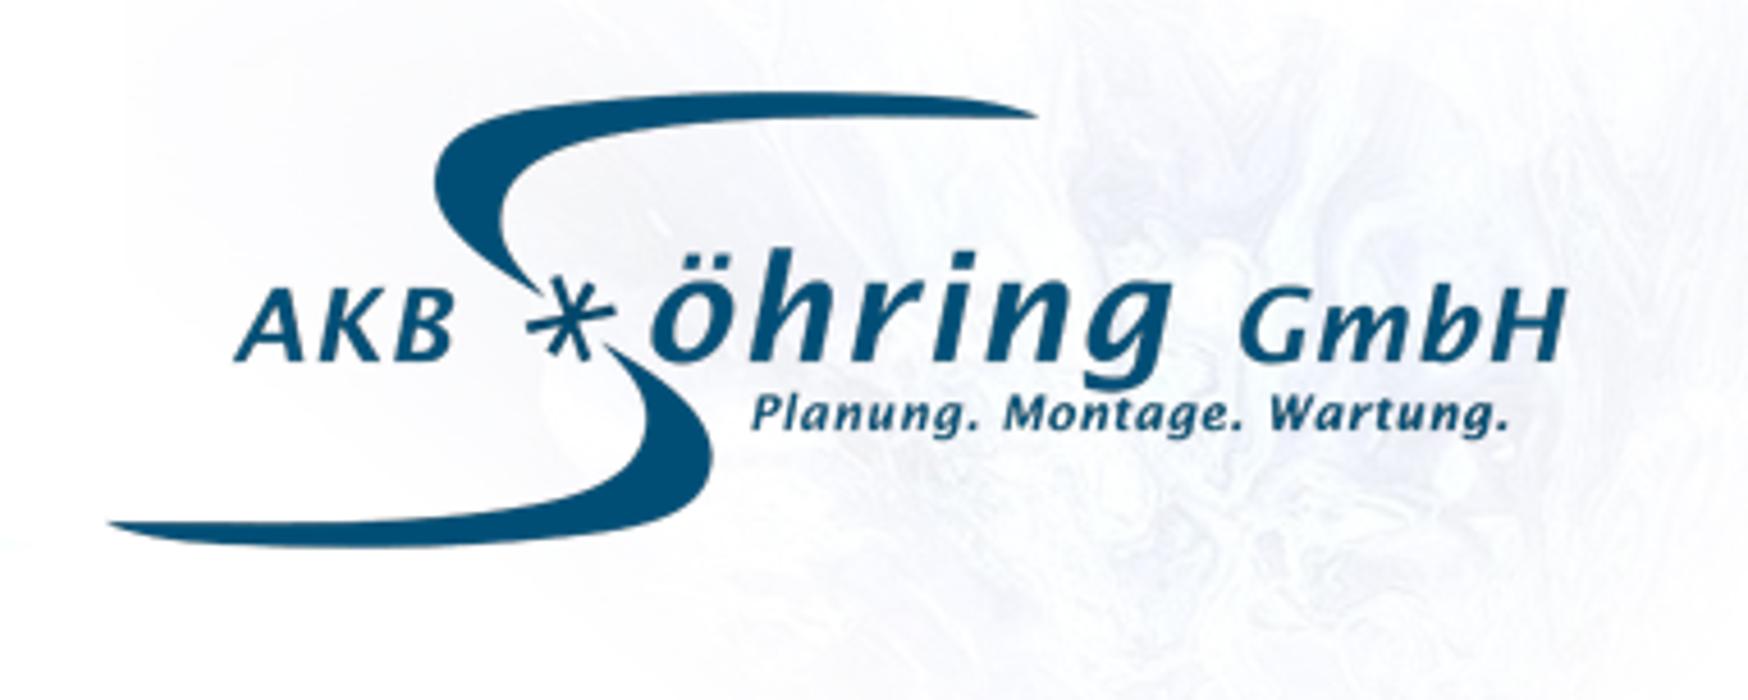 Bild zu AKB-Söhring GmbH in Berlin